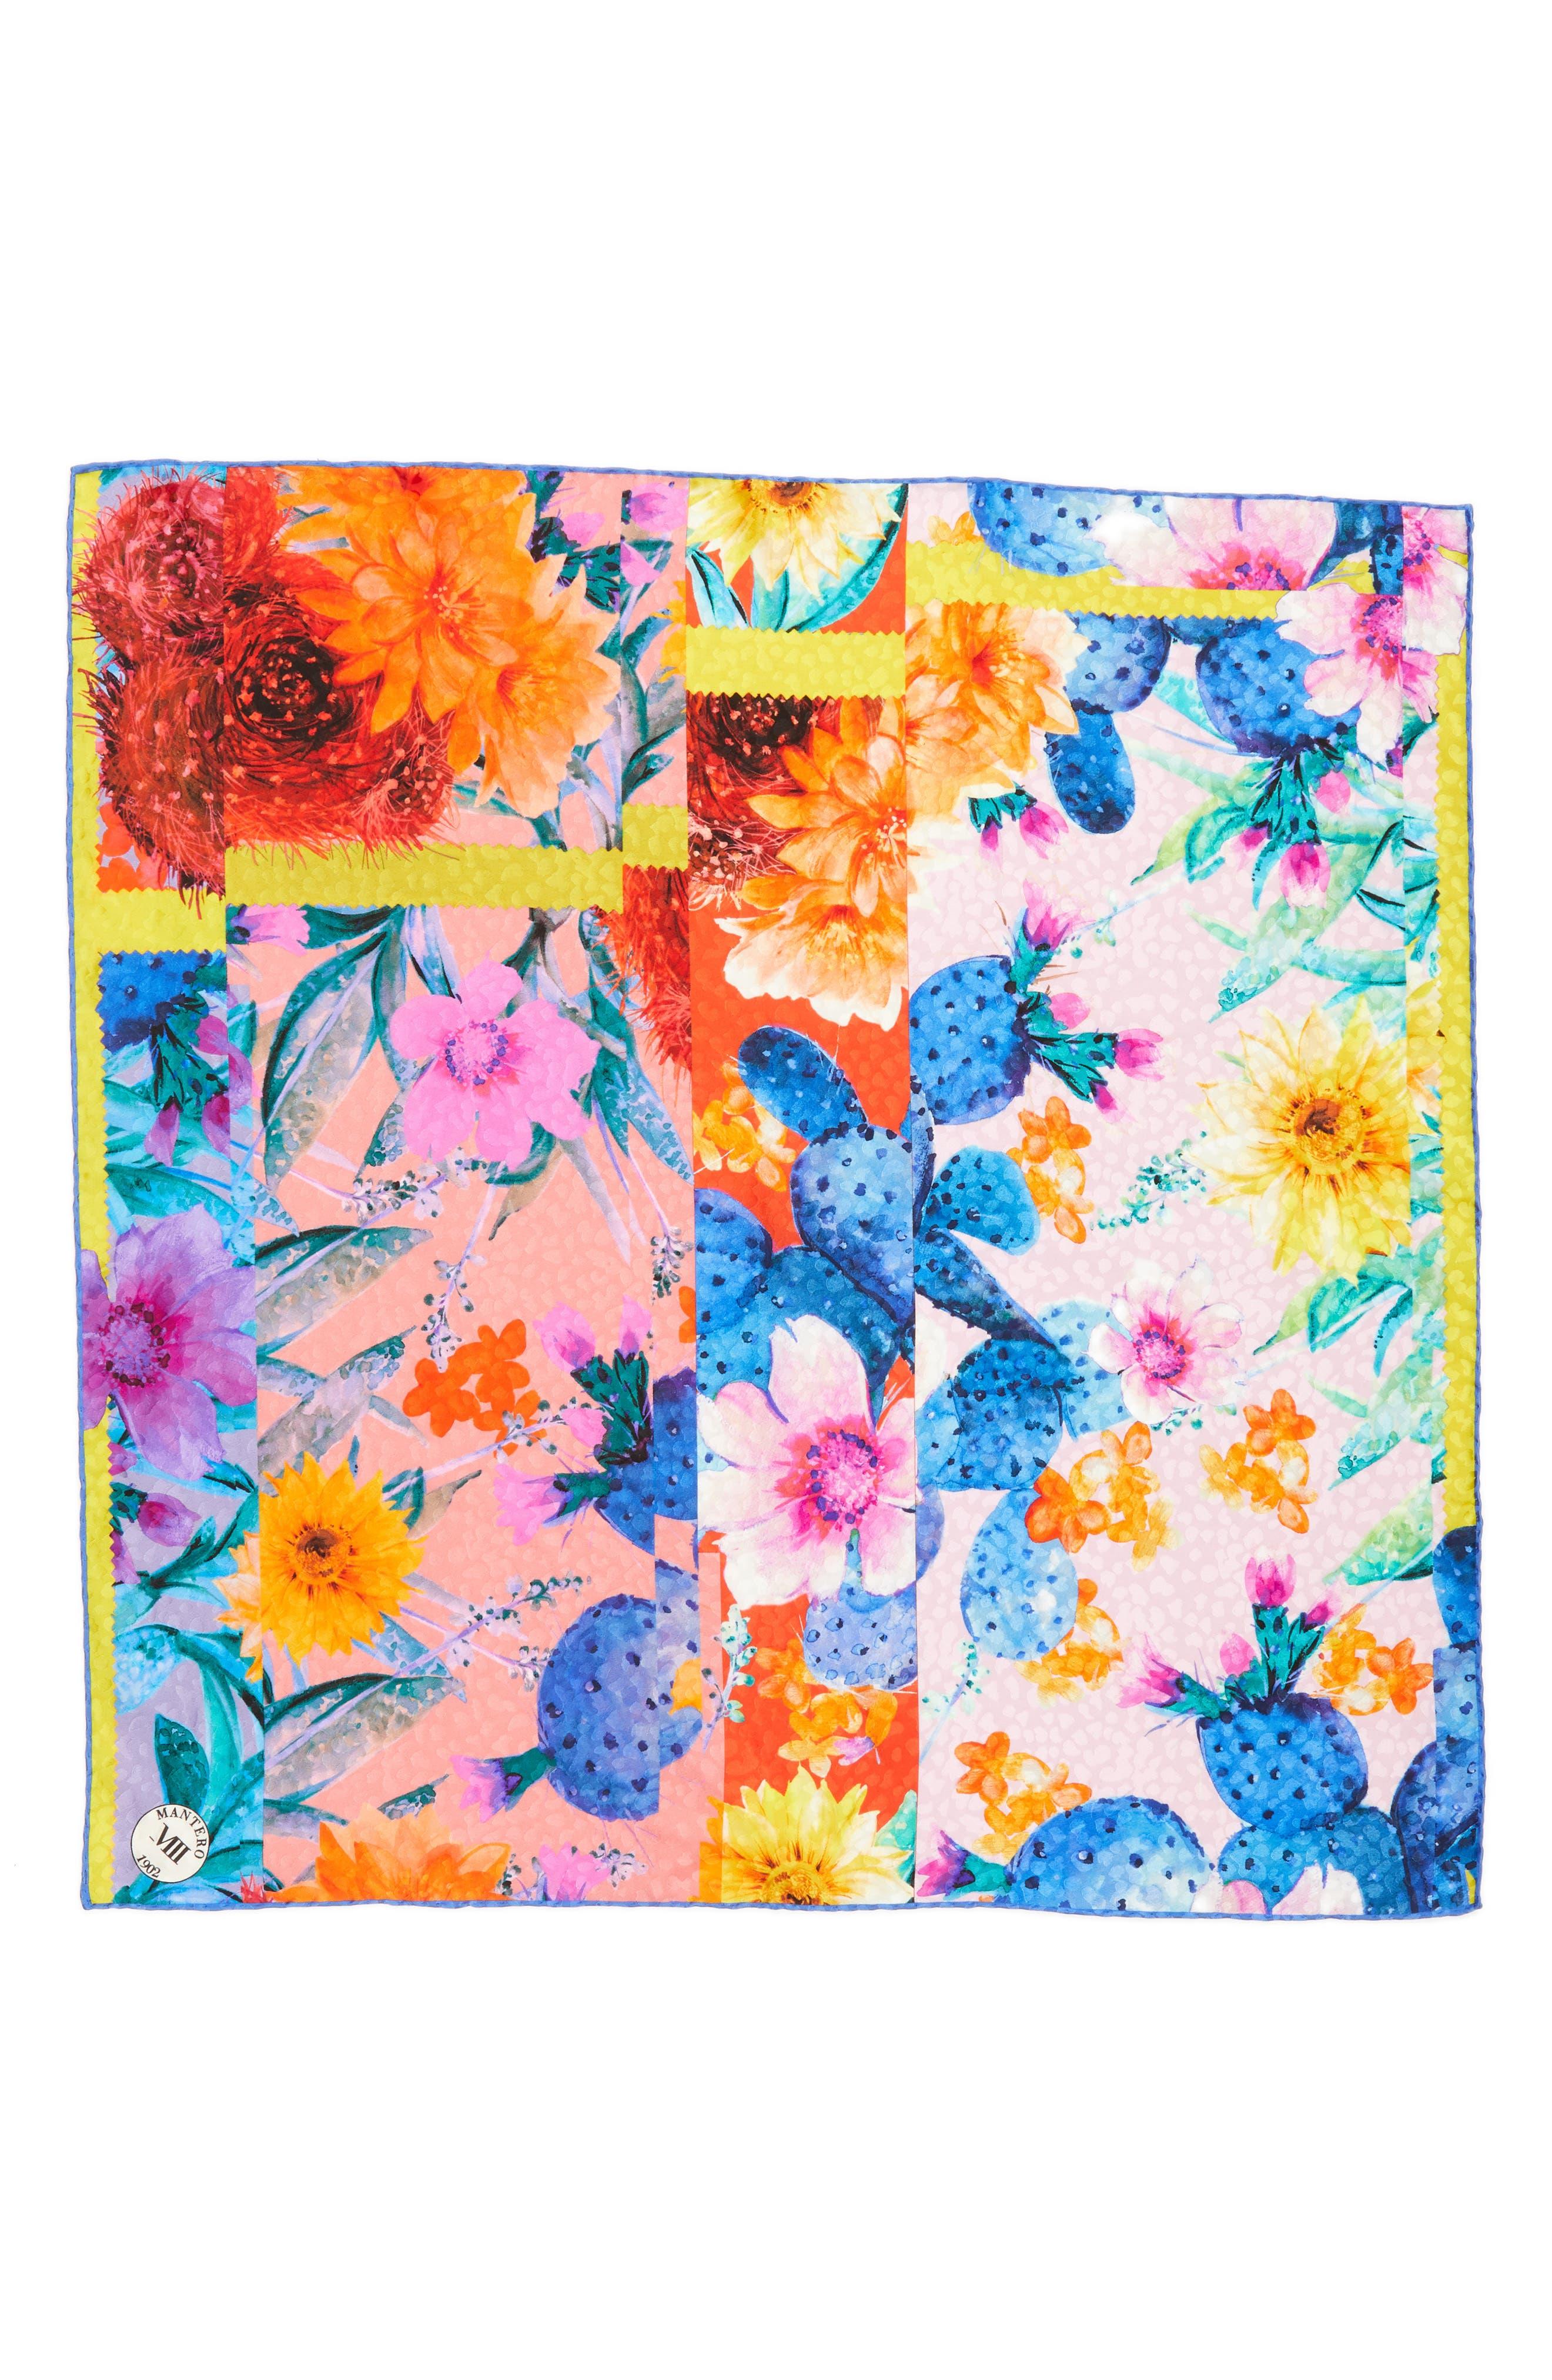 Icona del Sud Square Silk Scarf,                             Main thumbnail 1, color,                             CORAL RED/ BLUE